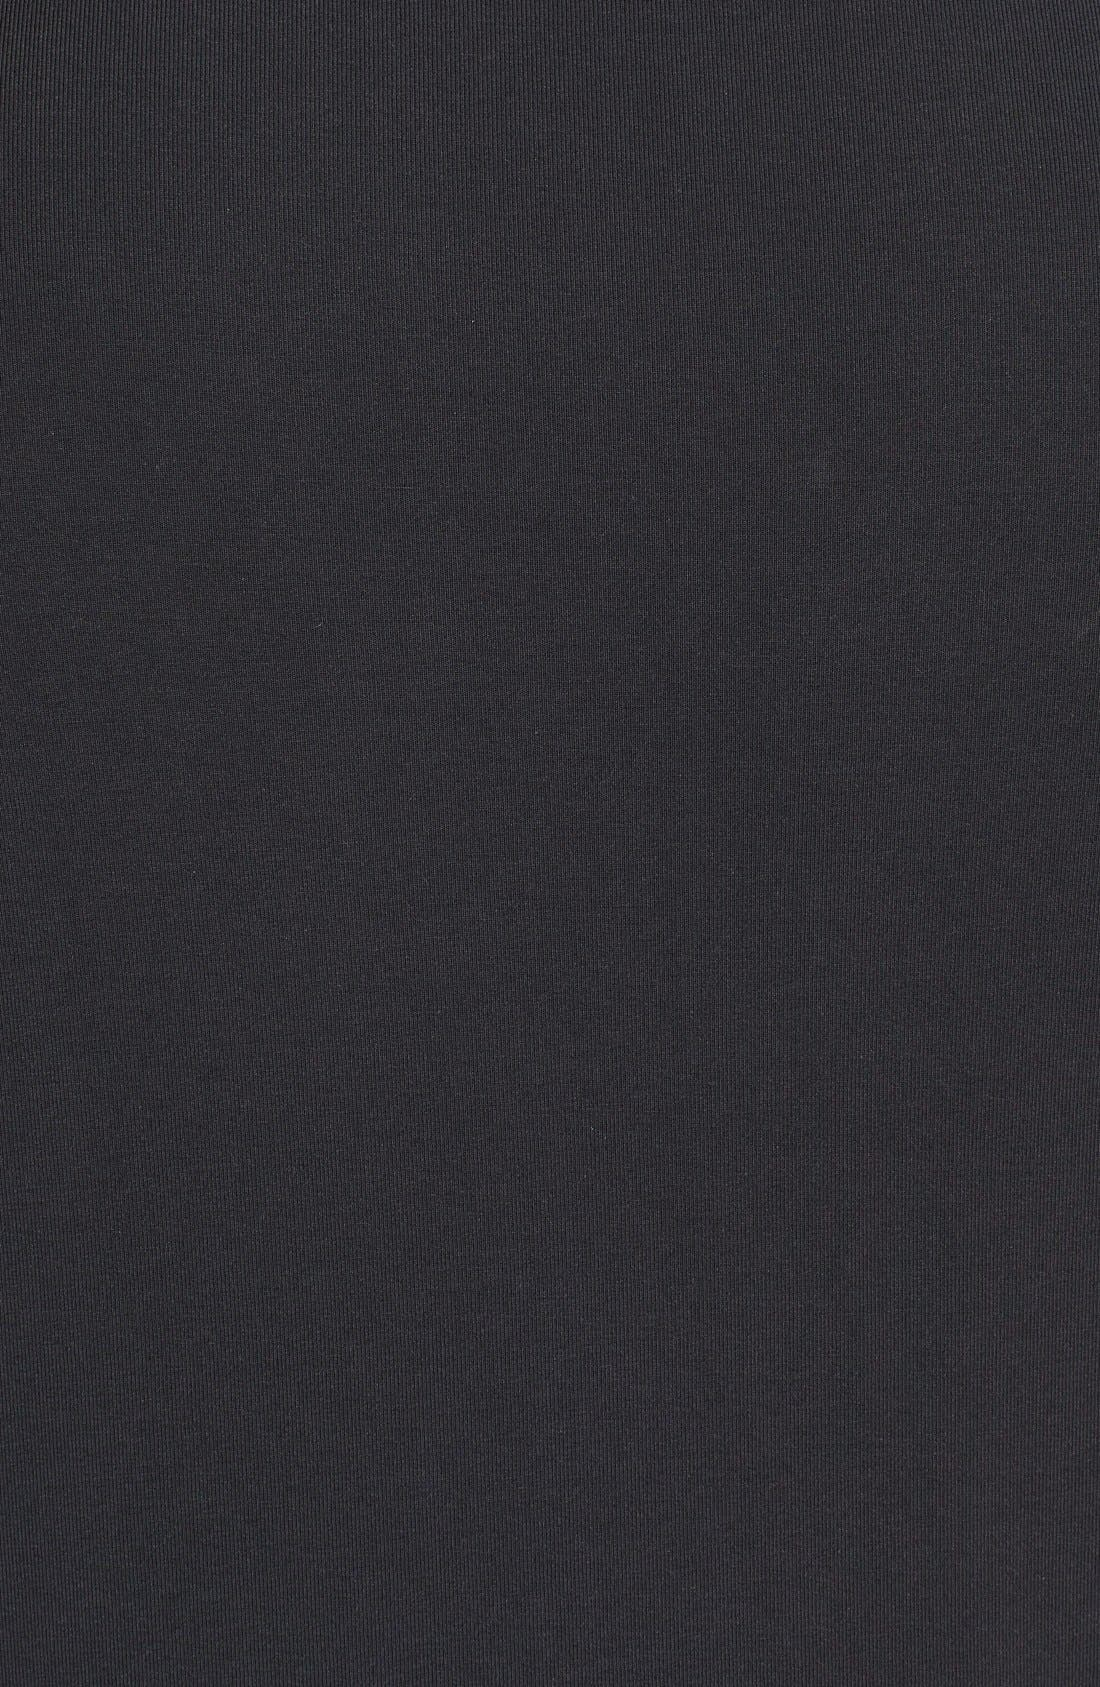 Alternate Image 3  - Travis Mathew 'Strange Love' Trim Fit Wrinkle Resistant Quarter Zip Jacket